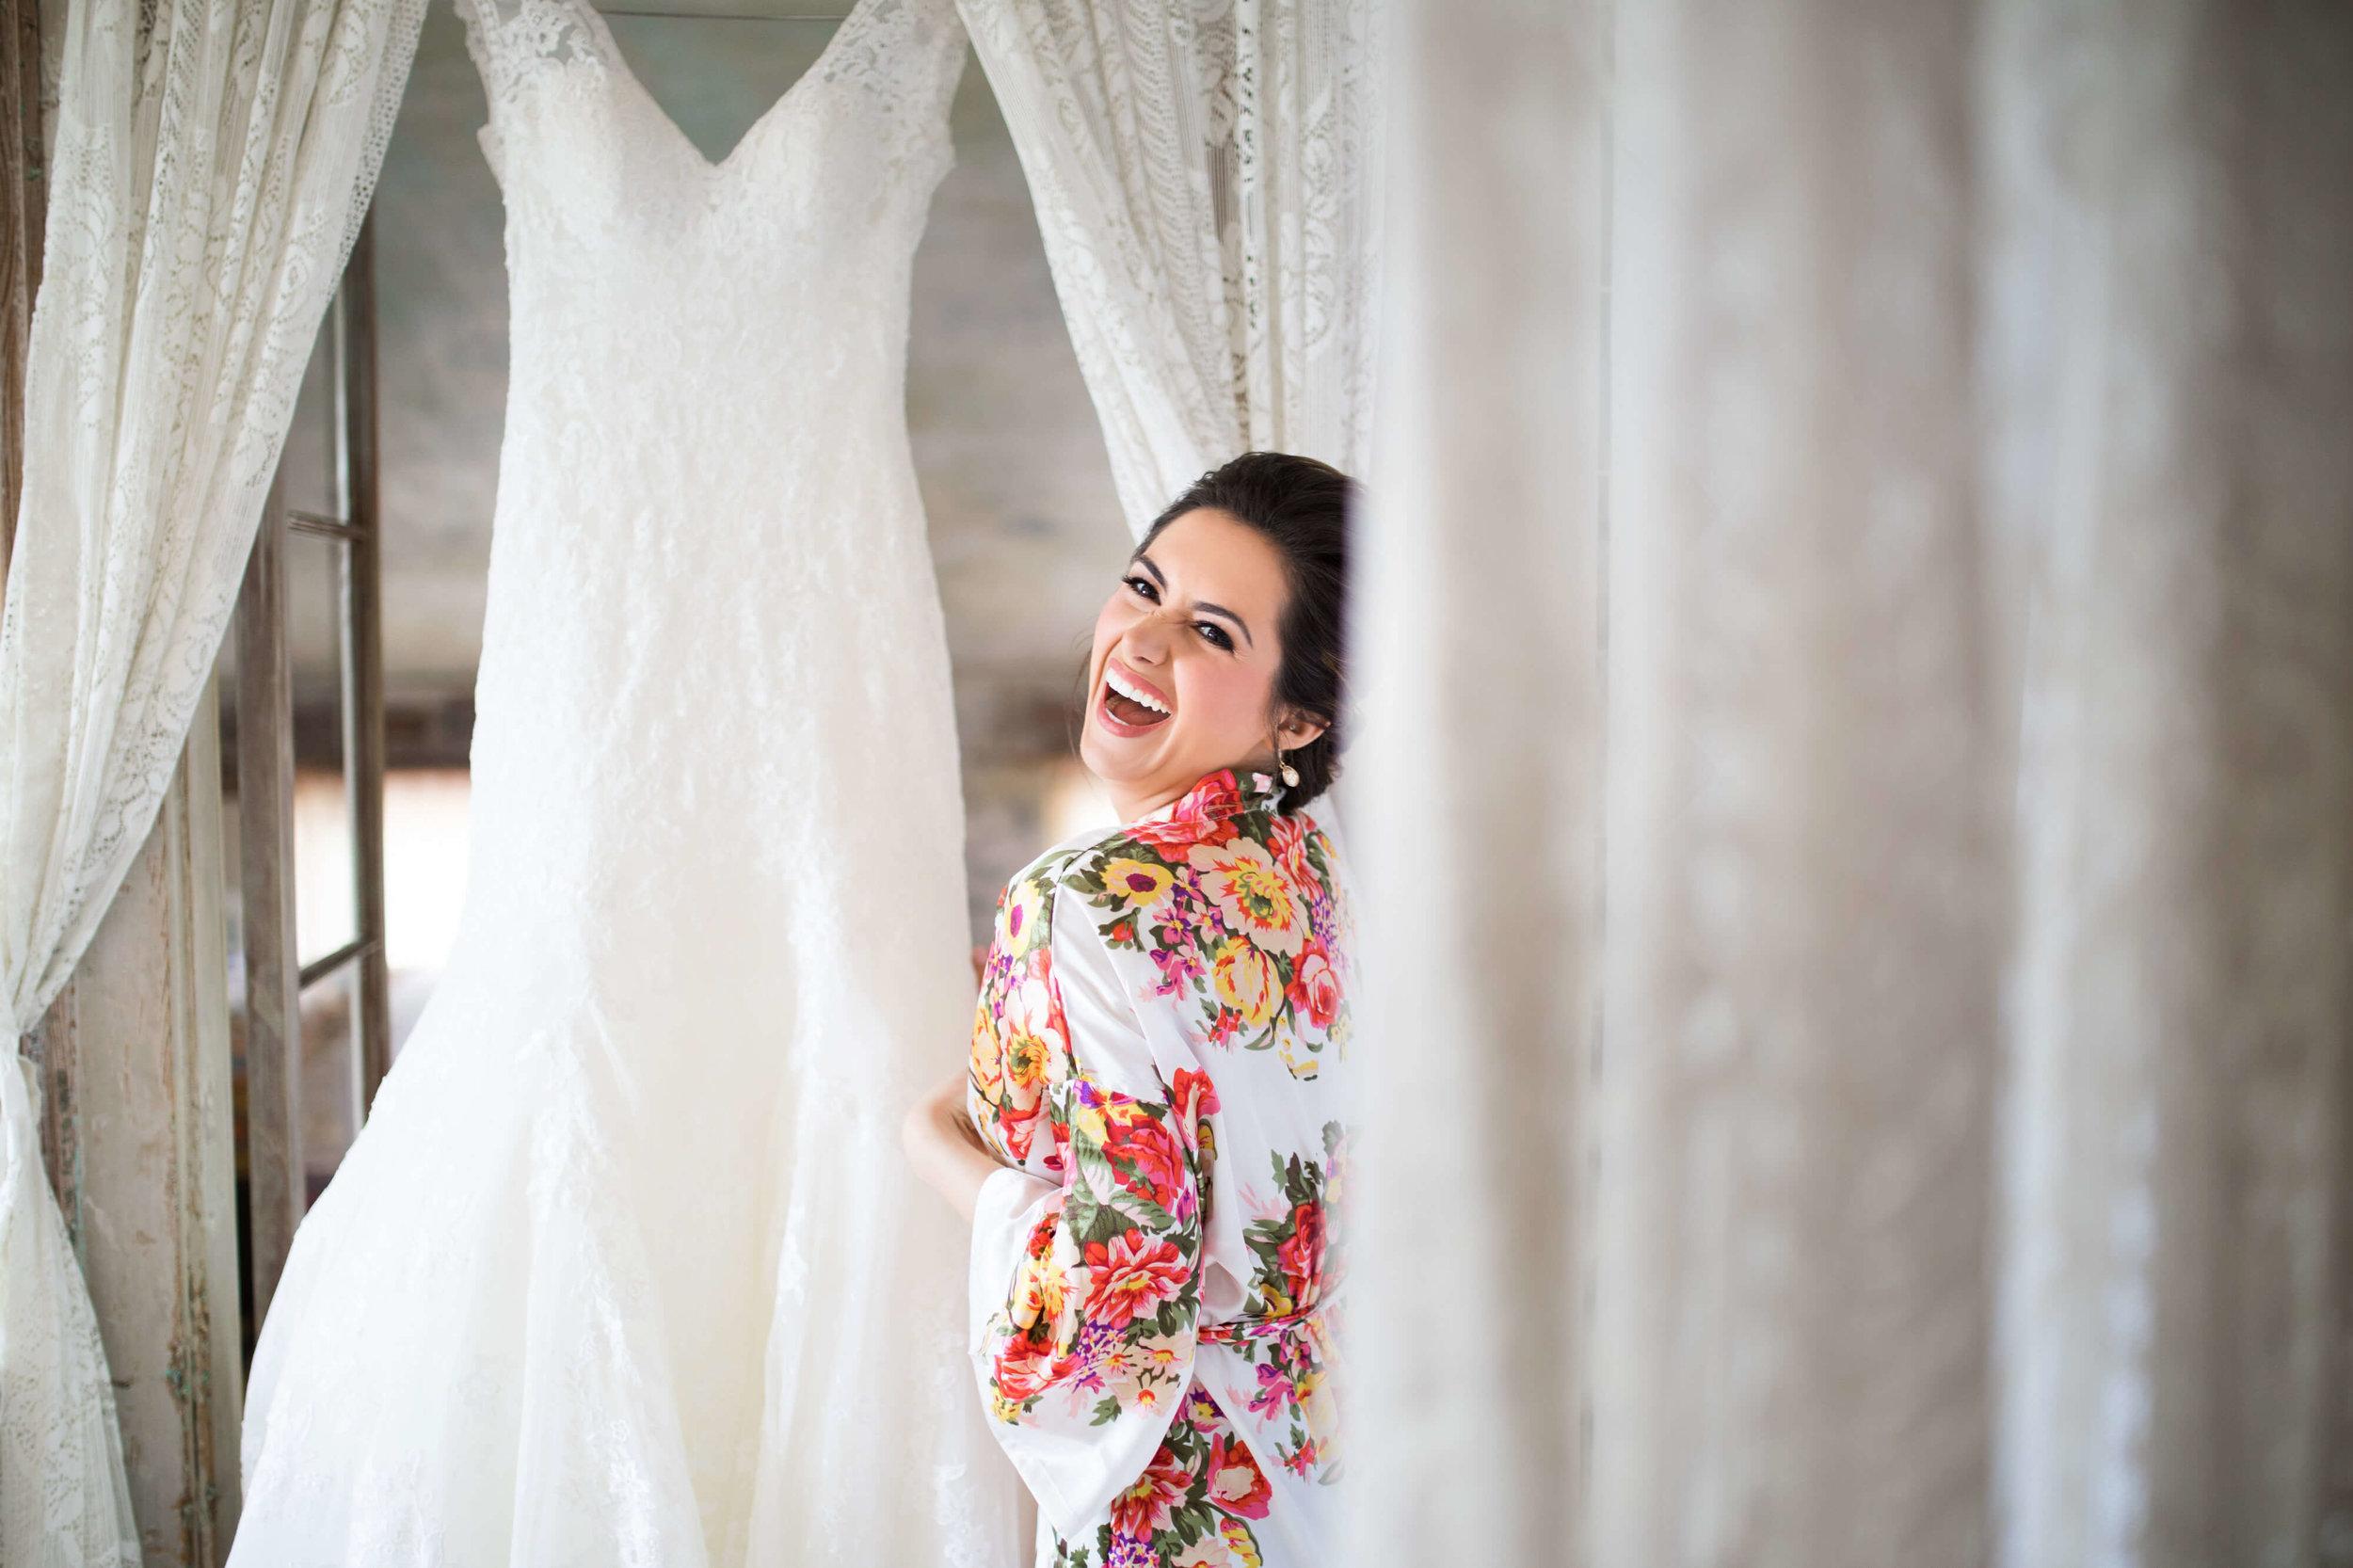 floral print getting ready robe | bride looking at her dress | Minnesota wedding photographer Studio KH wedding dress details | wedding blog | Sixpence Events 70 Ways to Photograph Your Wedding Dress